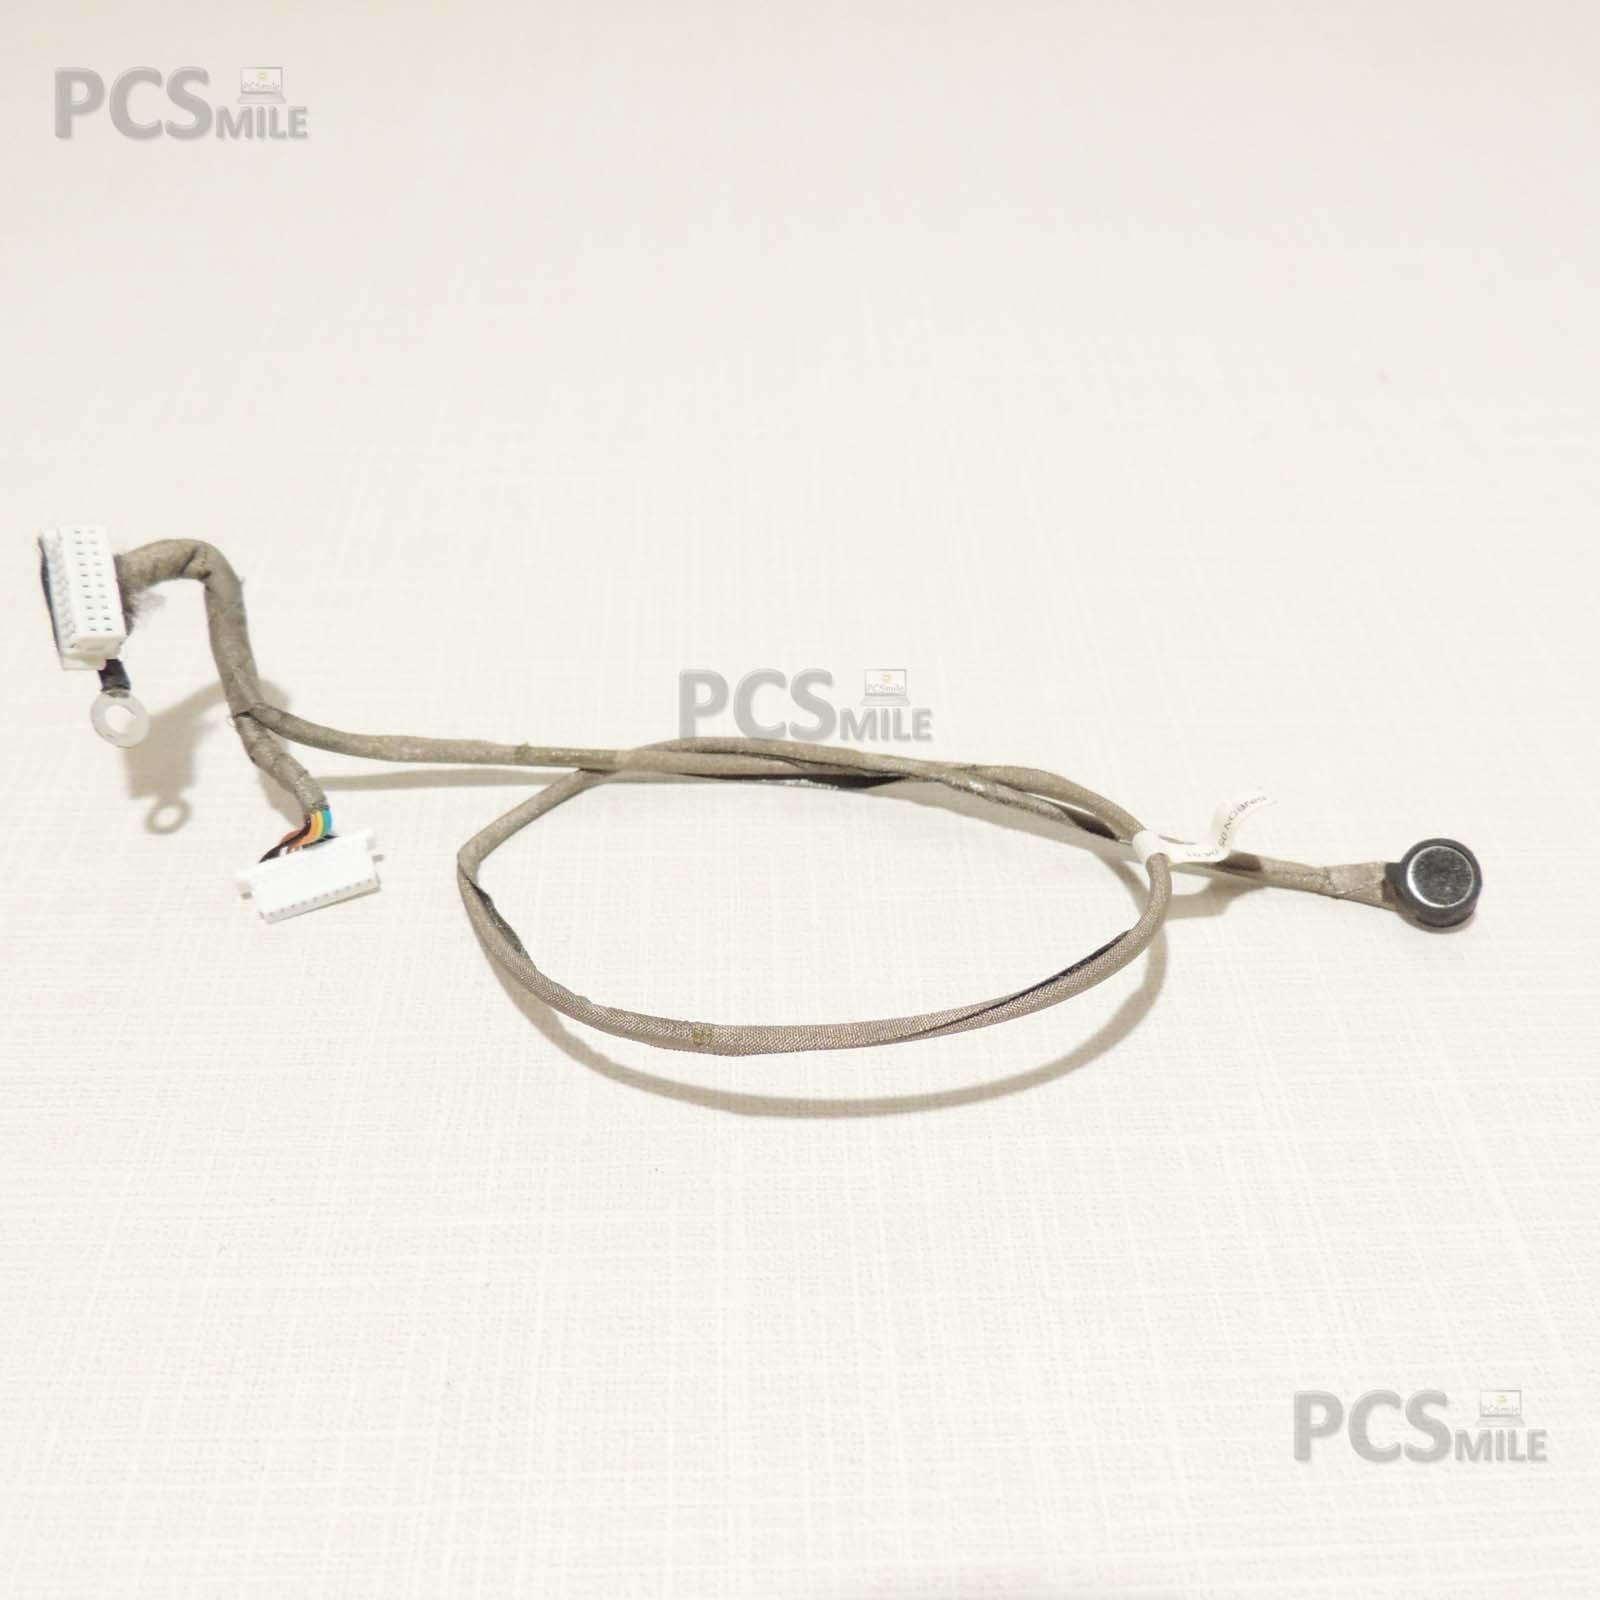 Asus A3000 Microfono 14-100030612L